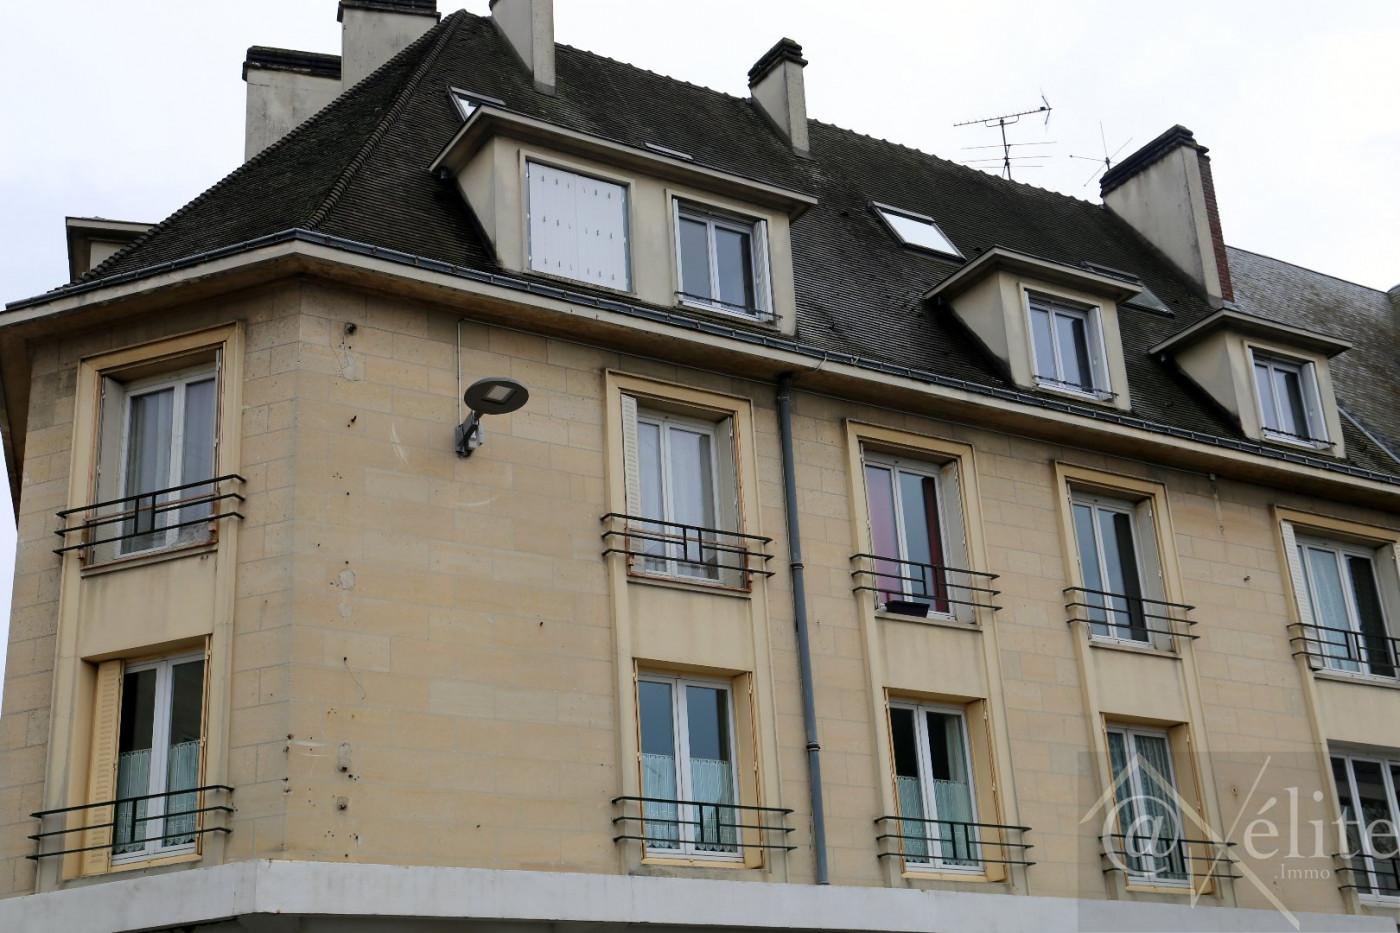 A vendre Beauvais 777922347 Axelite sas